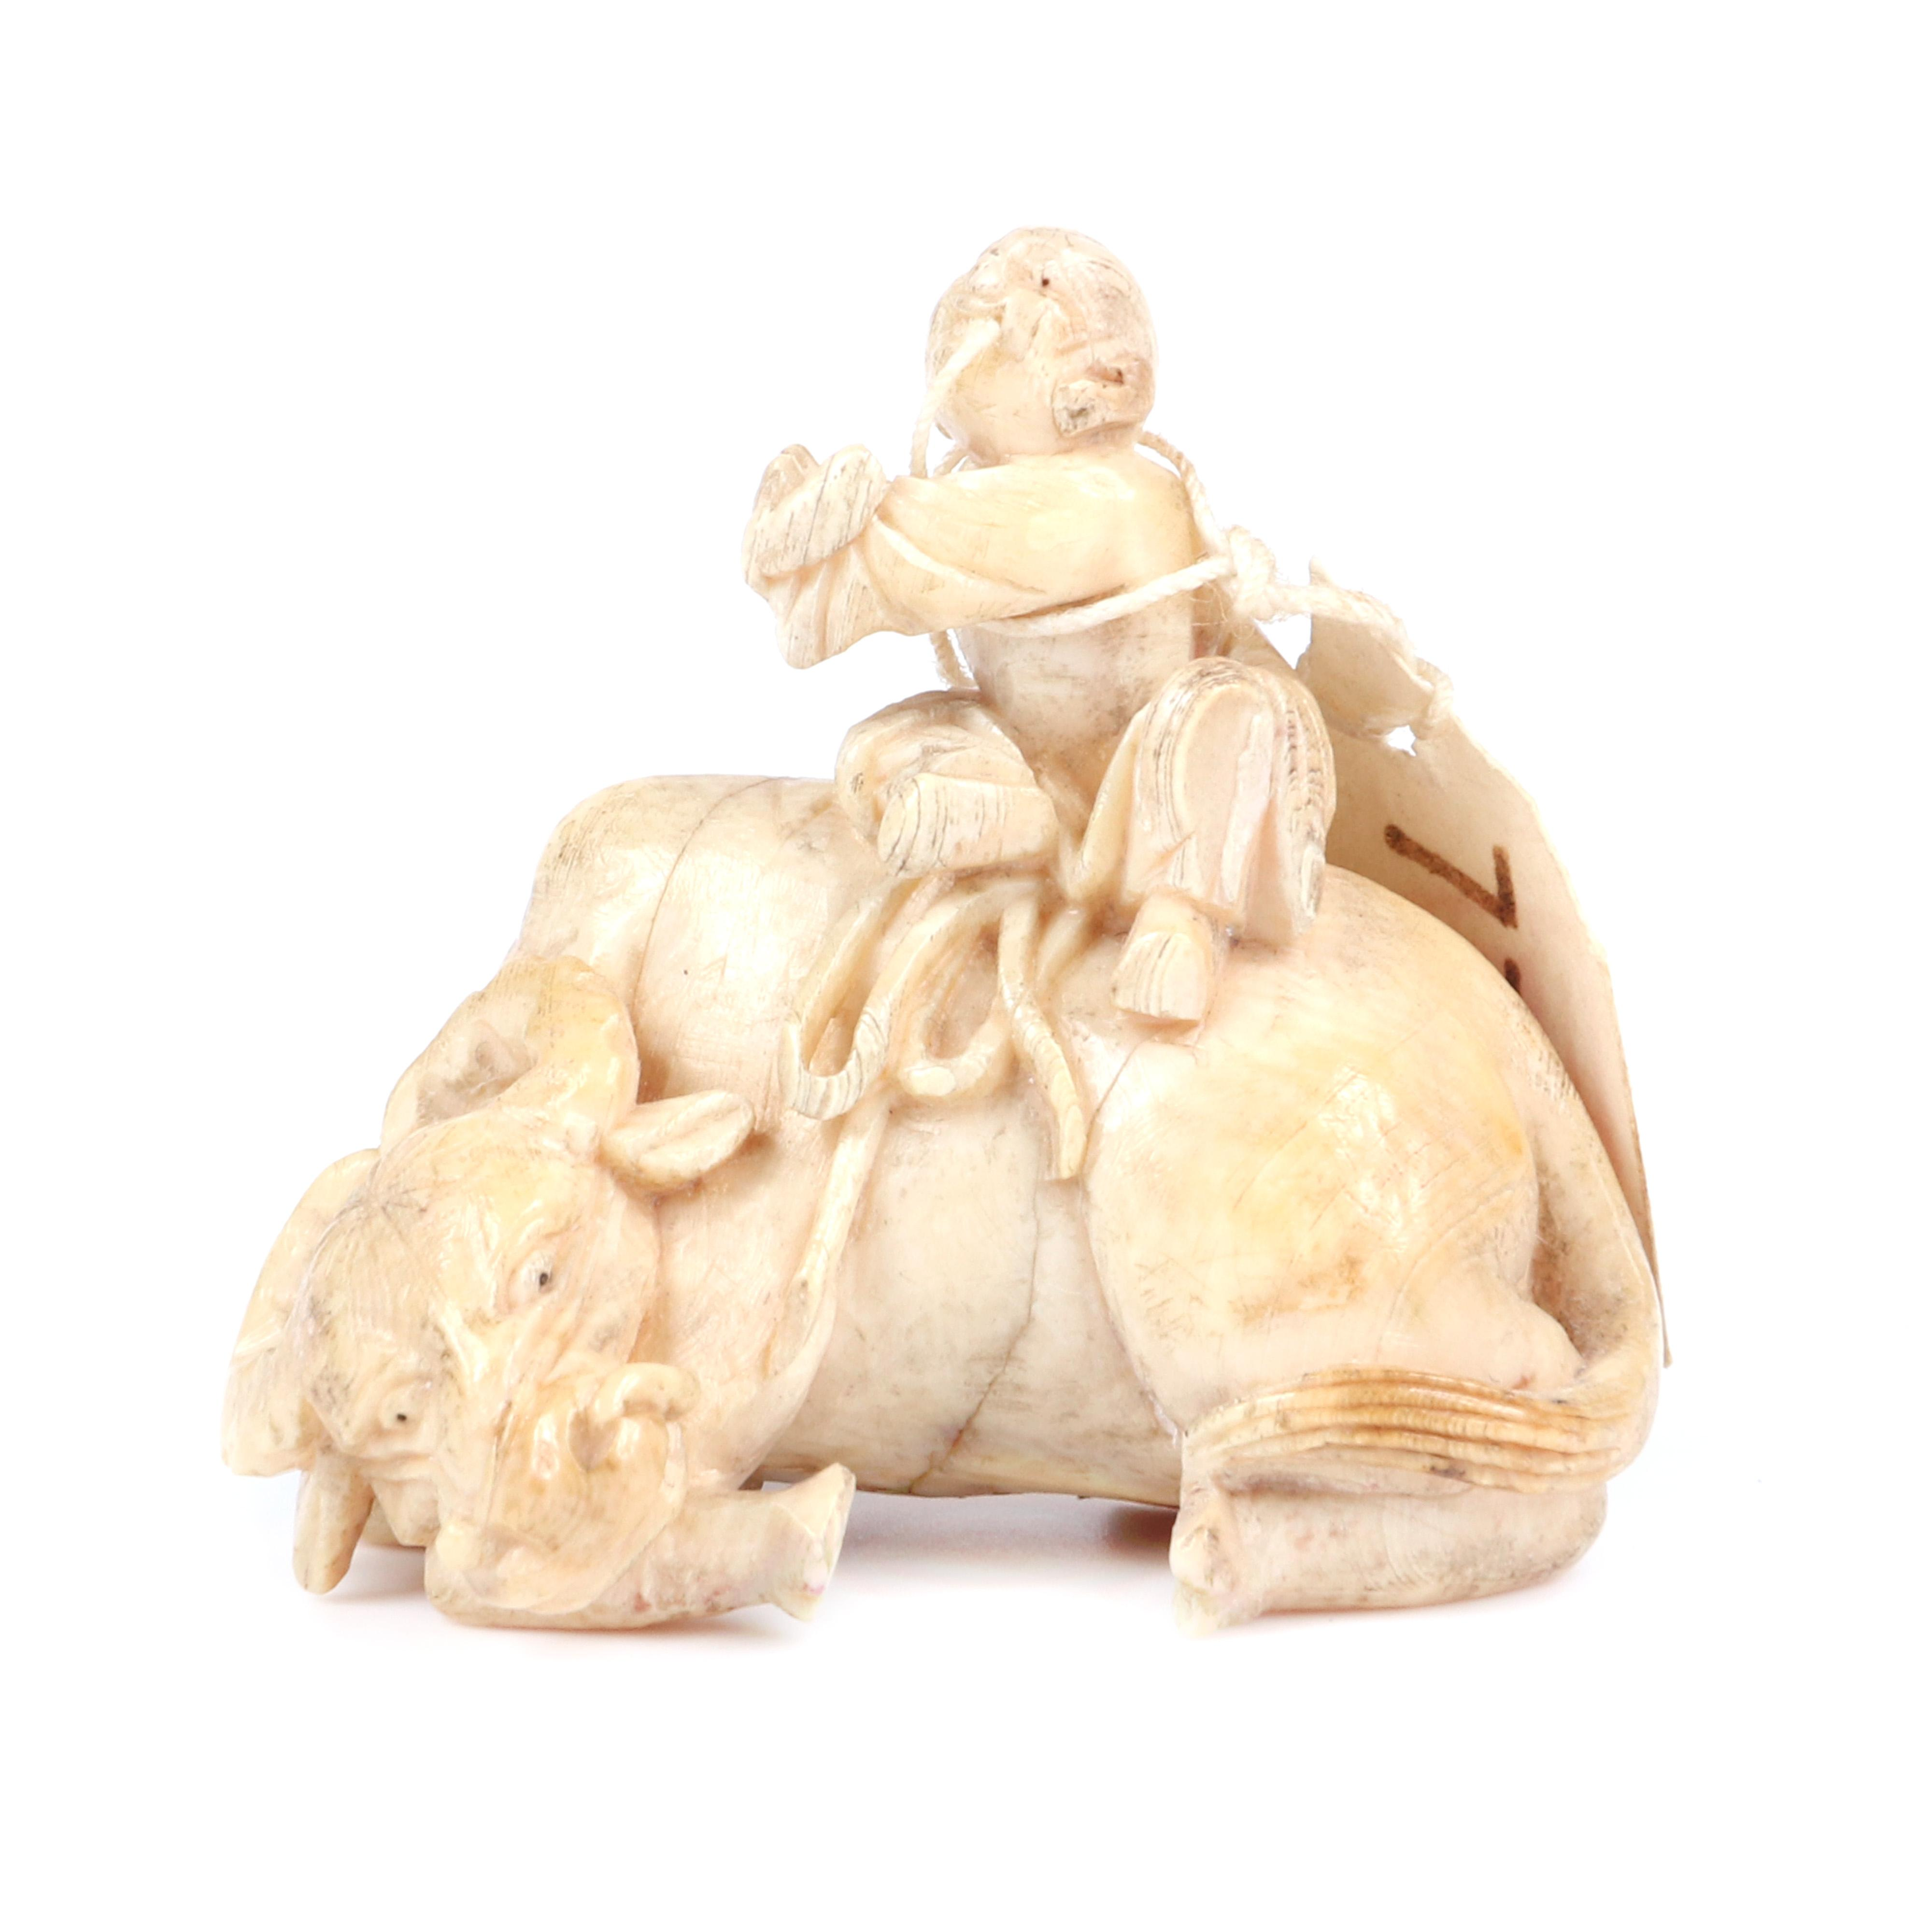 "Japanese miniature figure group carving / netsuke depicting a boy on recumbent water buffalo. Signed under base. 1 1/4""H x 1 1/2""W"